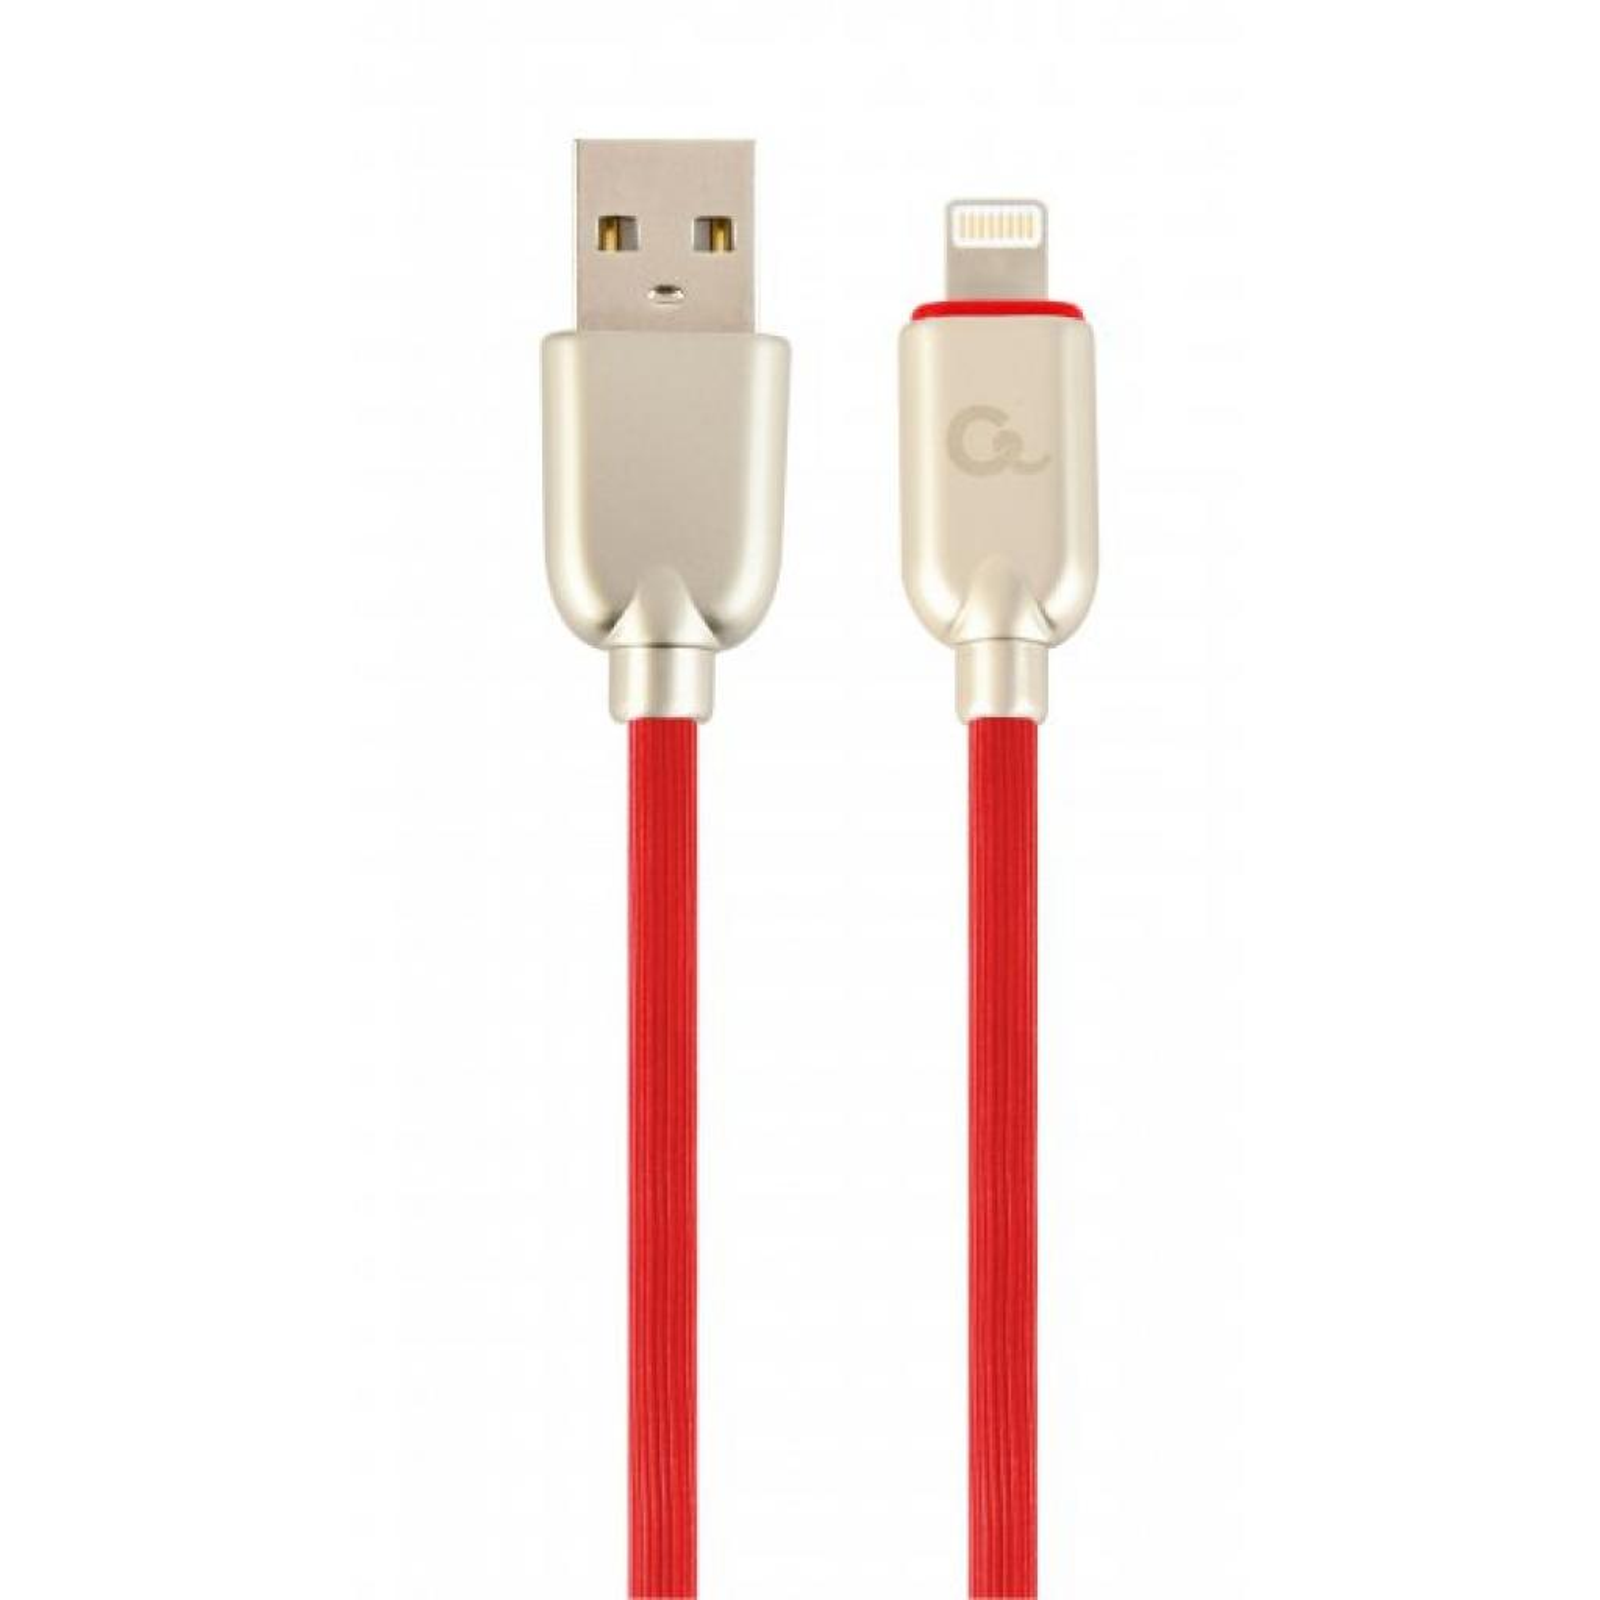 Дата кабель USB 2.0 AM to Lightning 2.0m Cablexpert (CC-USB2R-AMLM-2M-W)